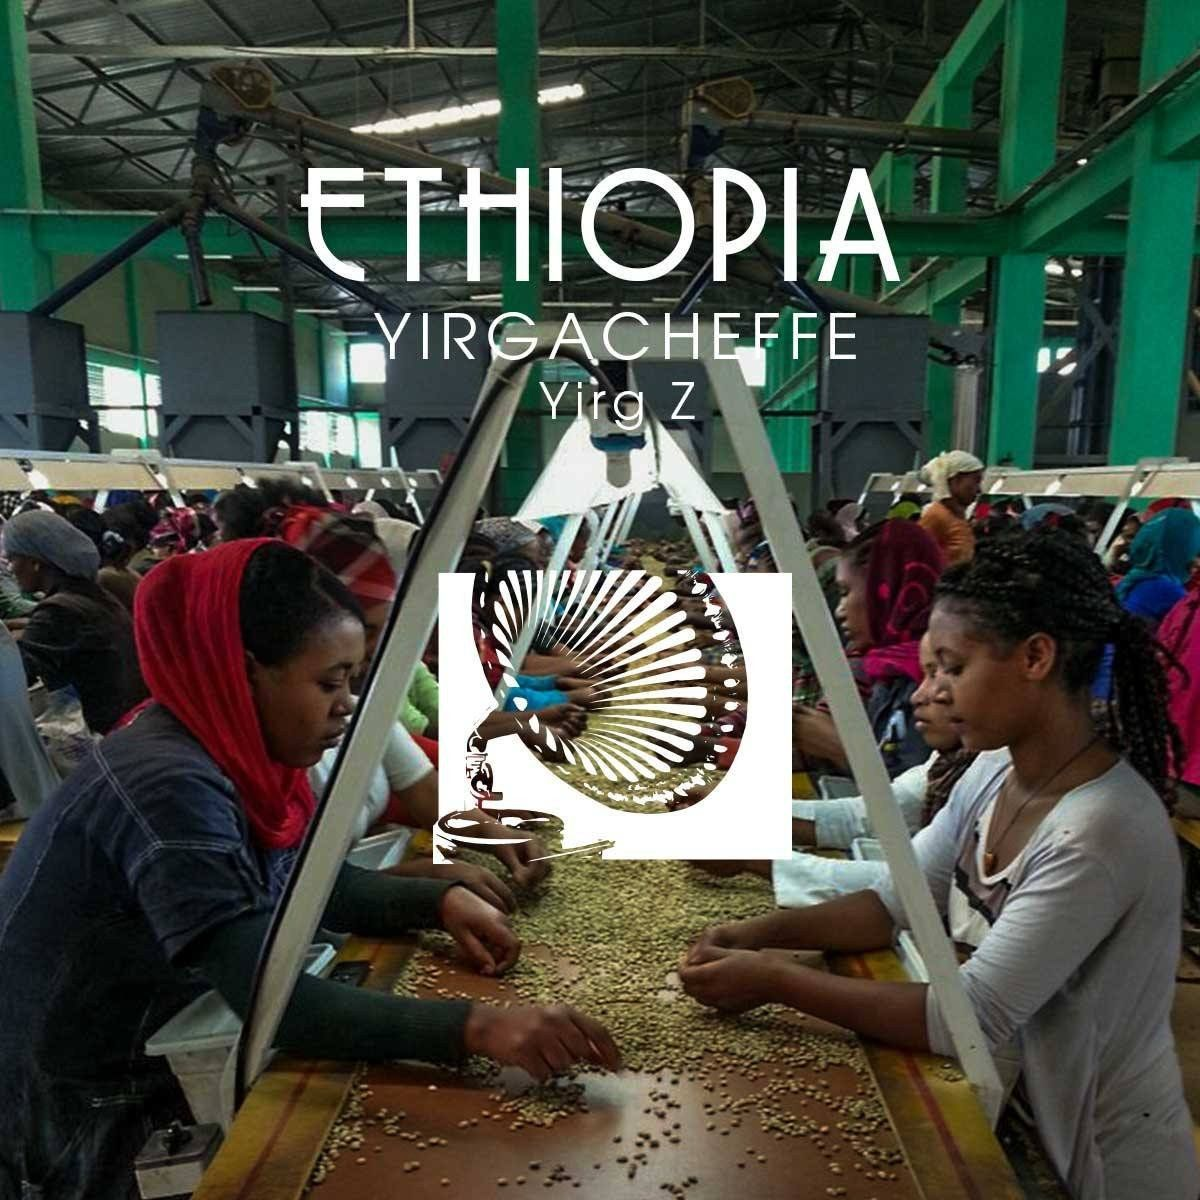 Ethiopia yirgacheffe yirgz in 2019 coriander seeds